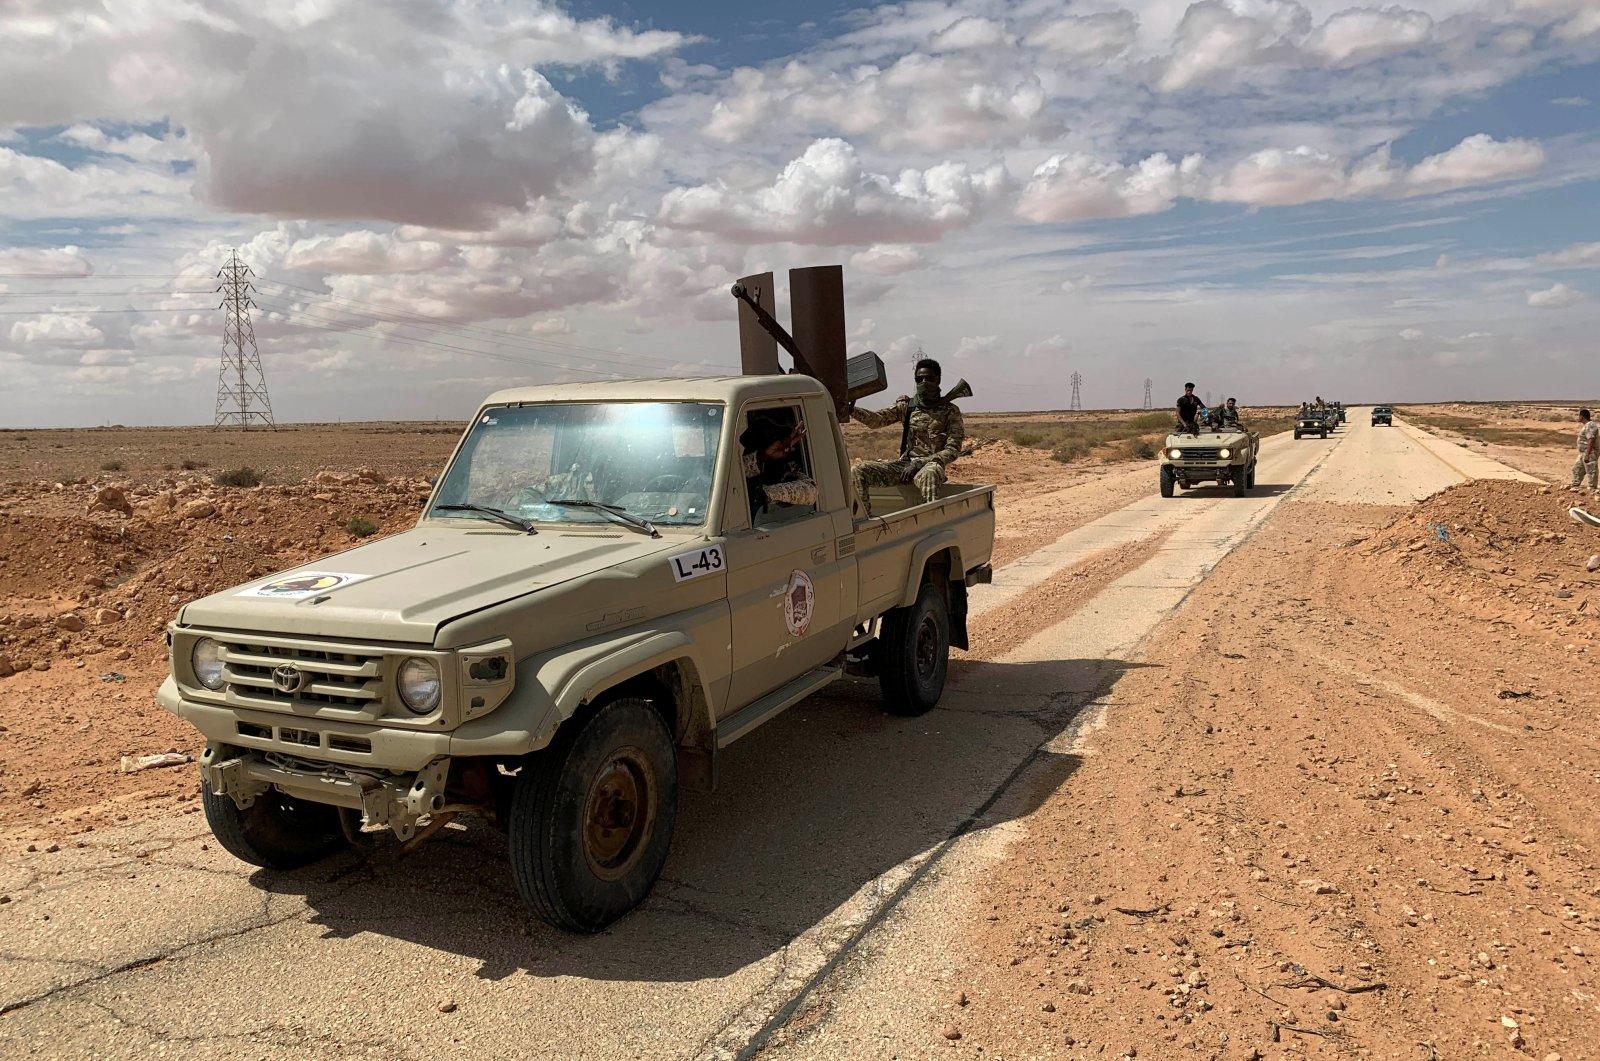 Troops loyal to Libya's internationally recognized government patrol the area in Zamzam, near Abu Qareen, Libya September 15, 2020. (REUTERS Photo)